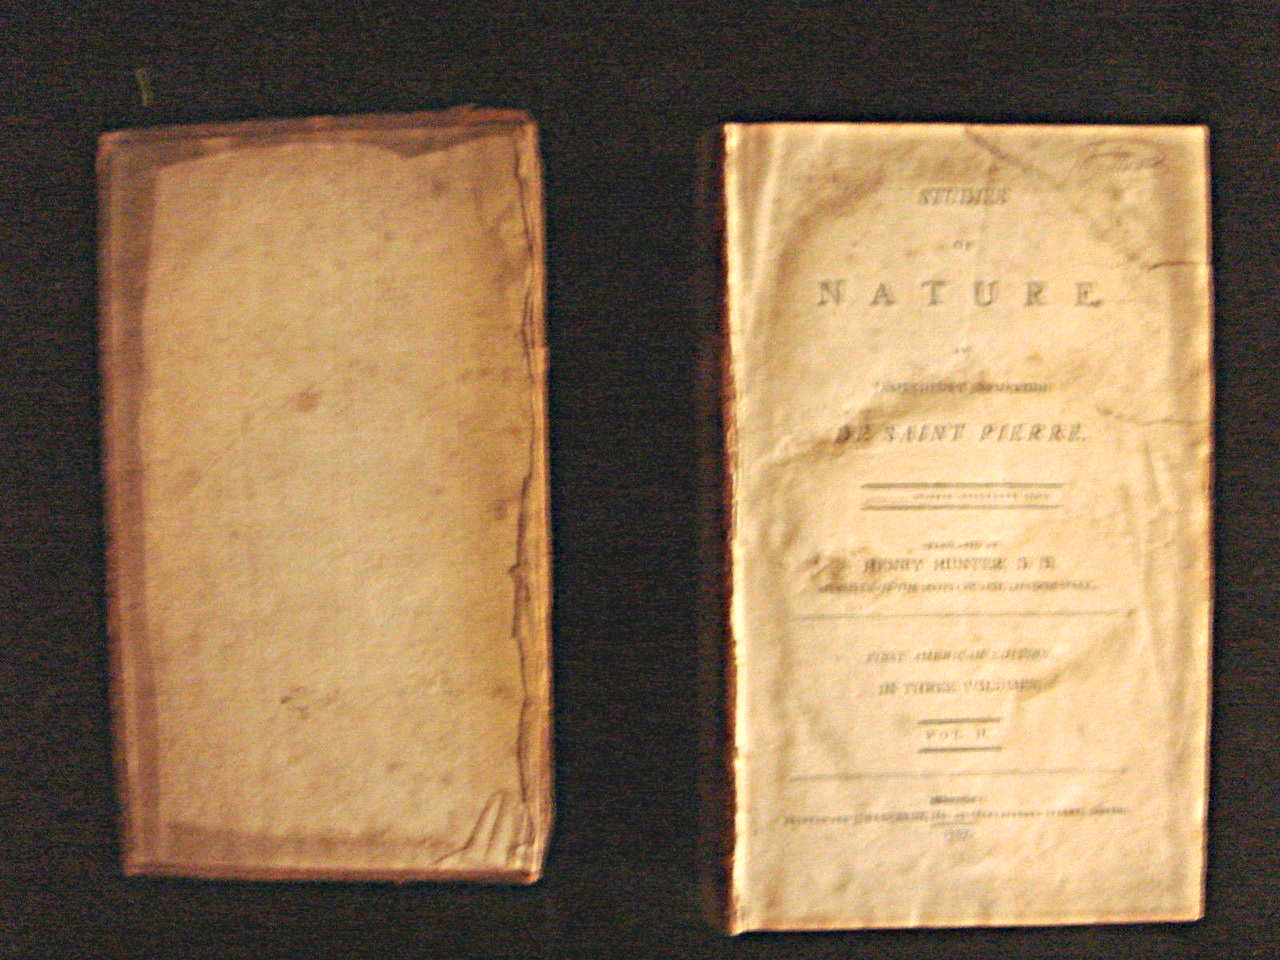 Studies of Nature James Henry Bernardin De Saint Pierre Henry Hunter 1797